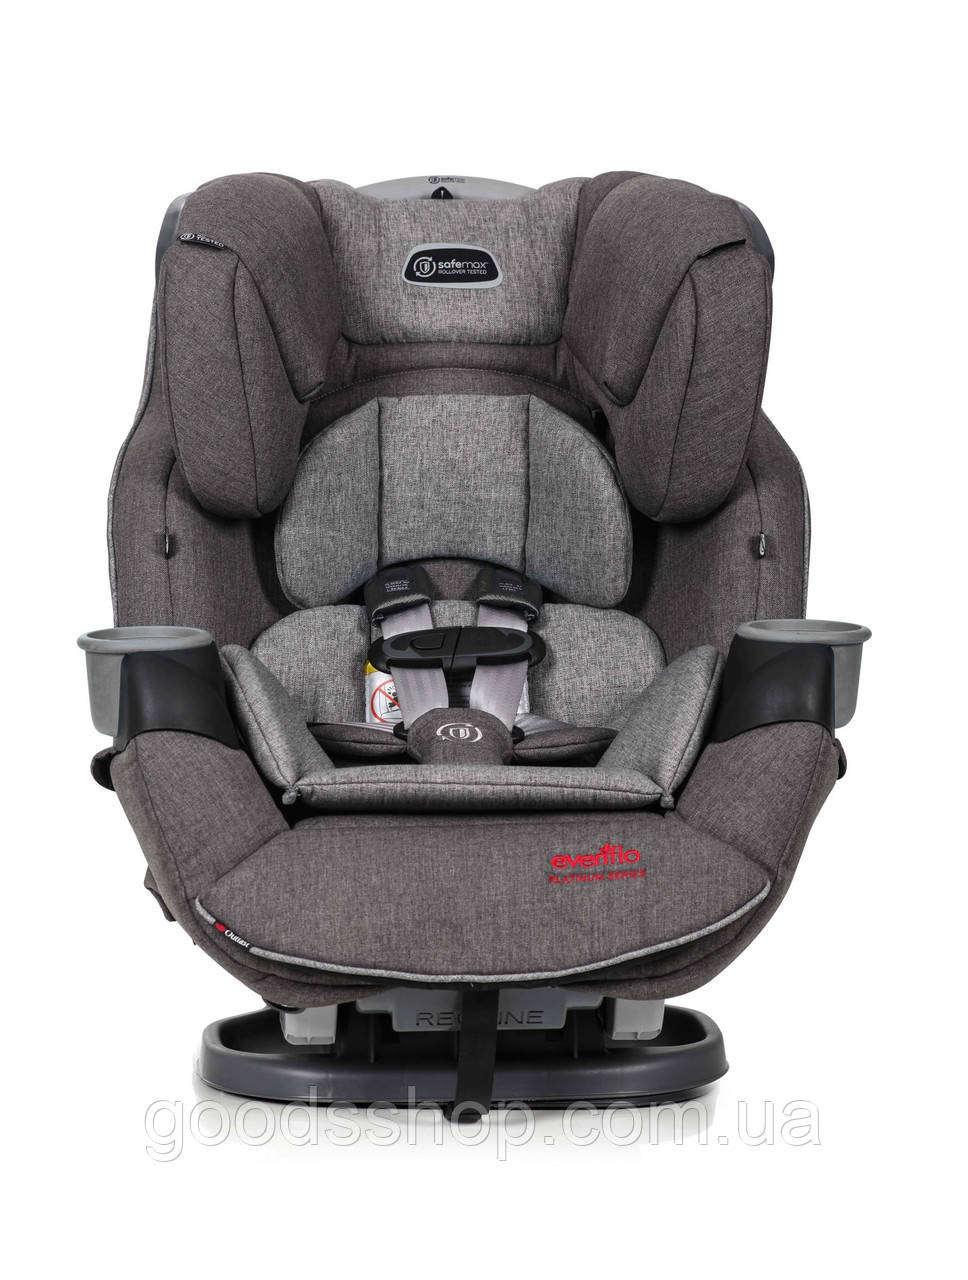 Evenflo® автокресло SafeMax Platinum цвет - Gray (группа от 2,2 до 54.4 кг)